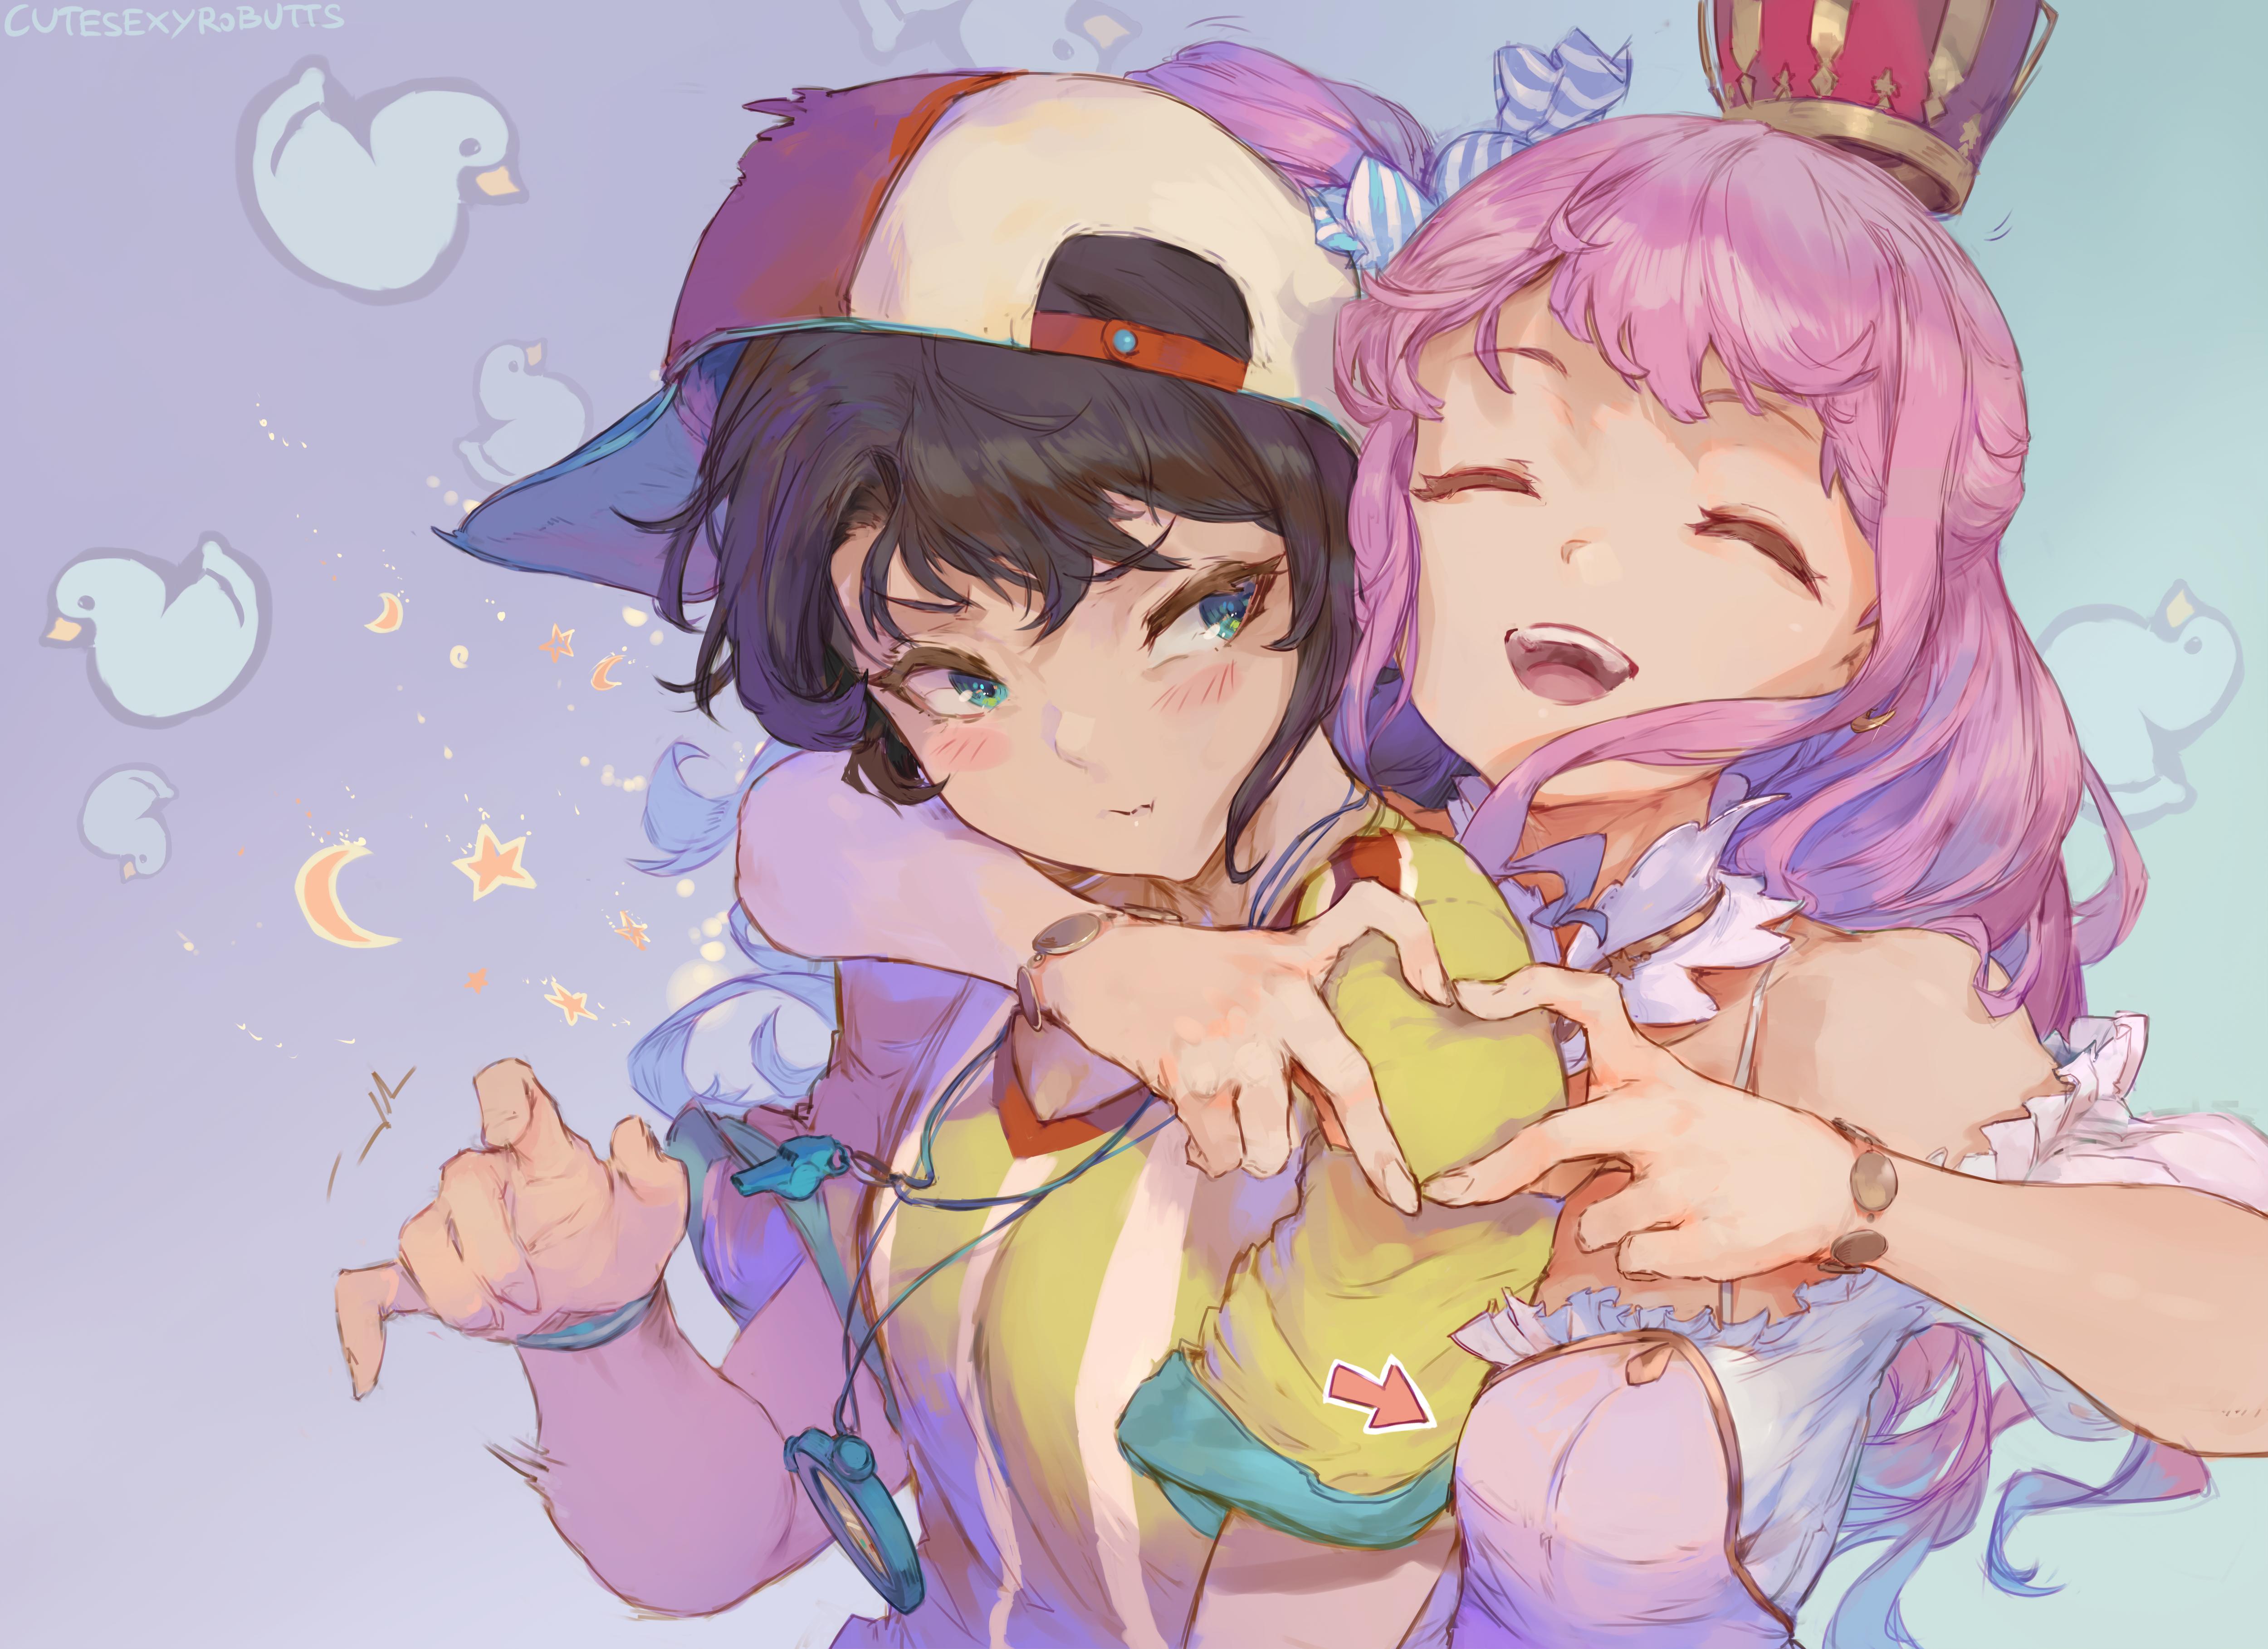 Anime 5000x3635 Oozora Subaru Himemori Luna Hololive Virtual Youtuber anime anime girls hugging blushing 2D artwork drawing illustration fan art Cutesexyrobutts